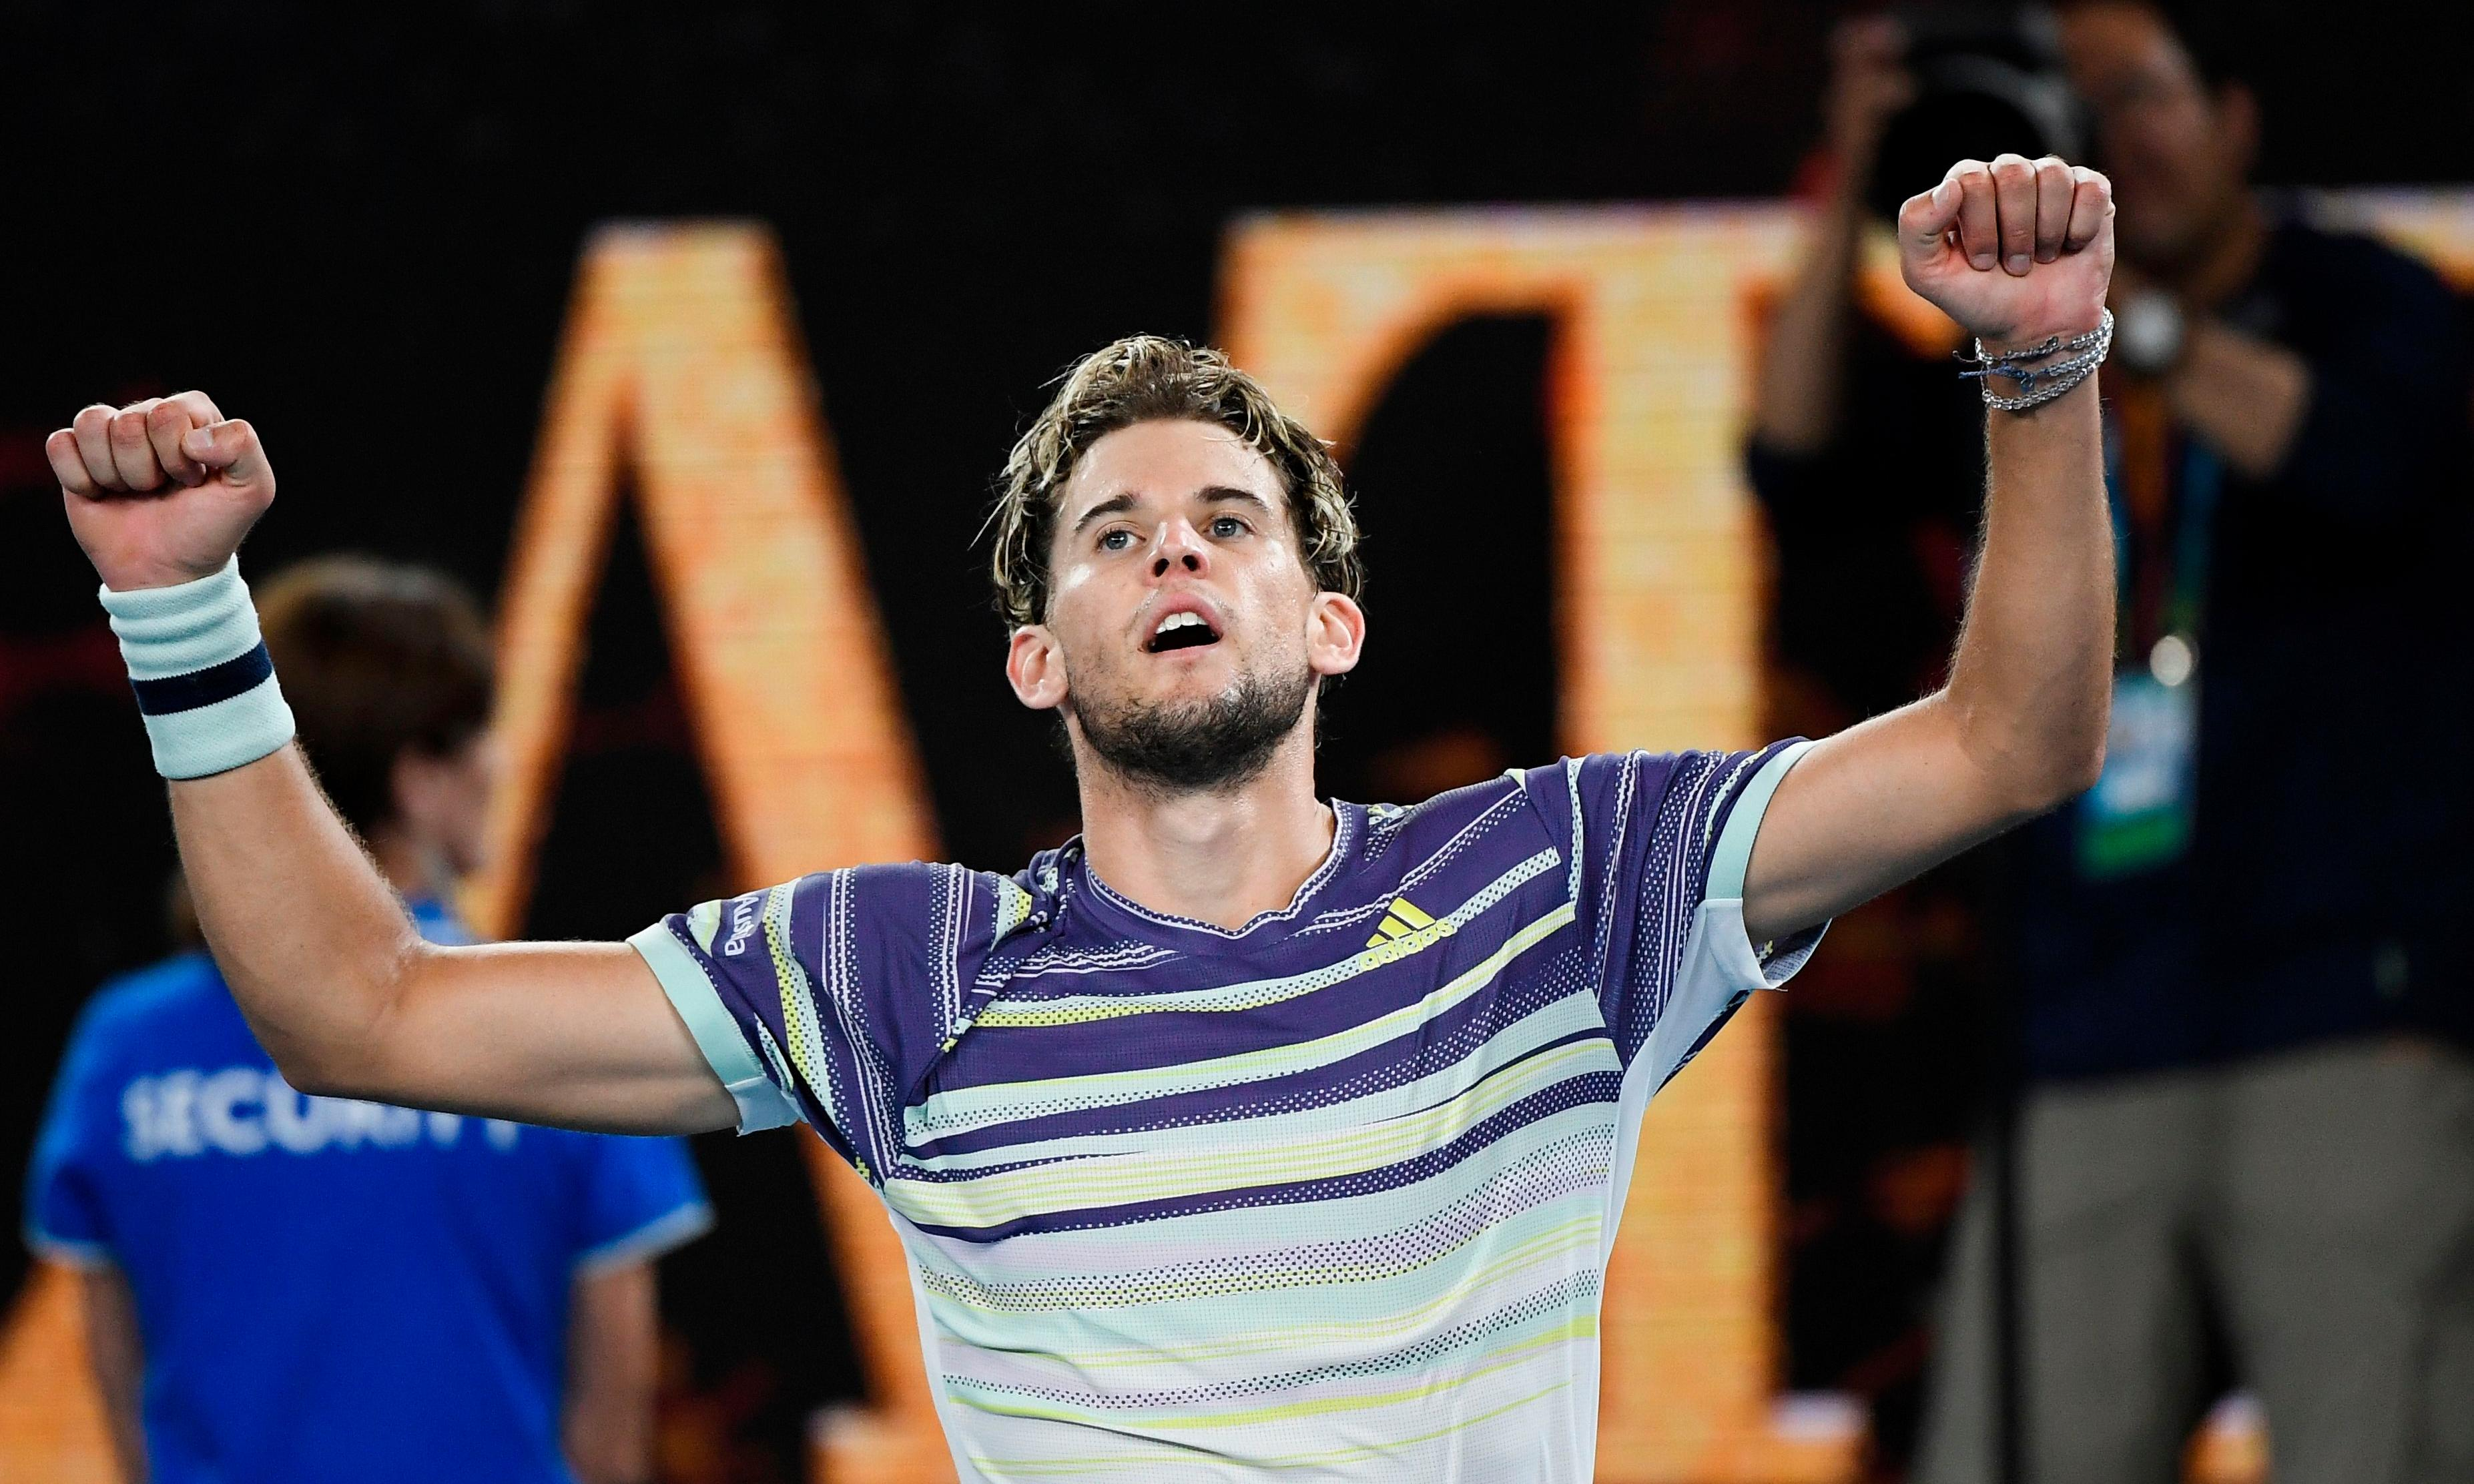 Dominic Thiem beats Zverev to set up Djokovic clash in Australian Open final